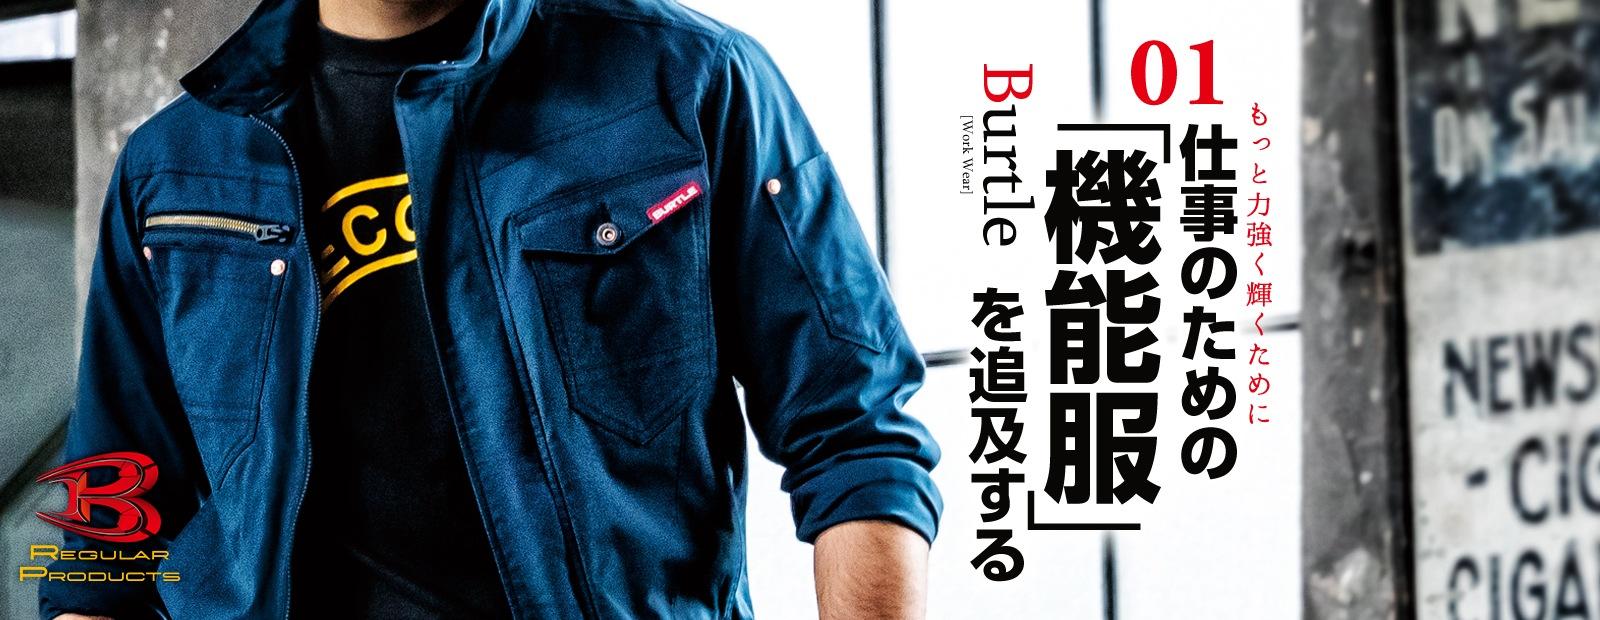 Burtle もっと力強く輝くために仕事のための「機能服」を追求する